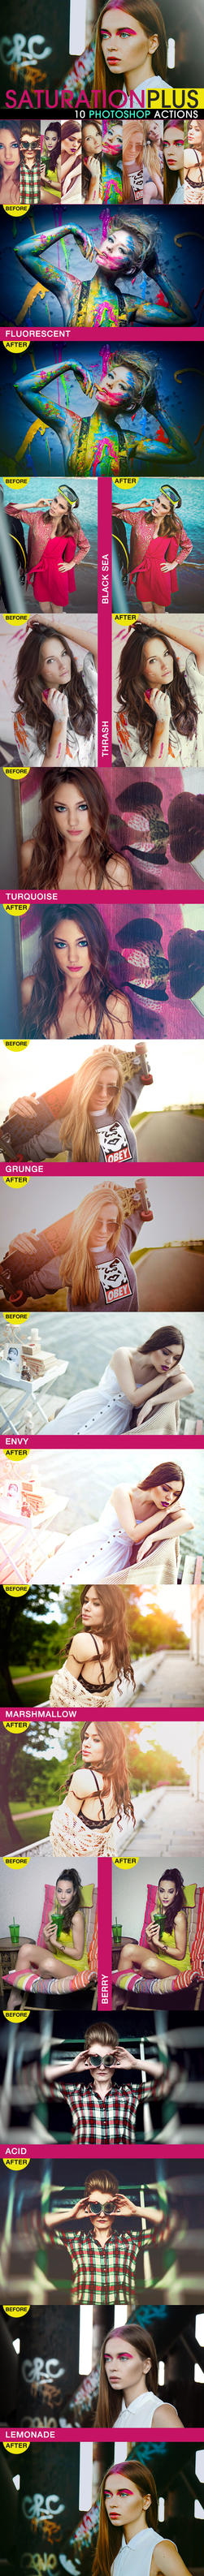 SaturationPLUS Photoshop Actions by LuciferB